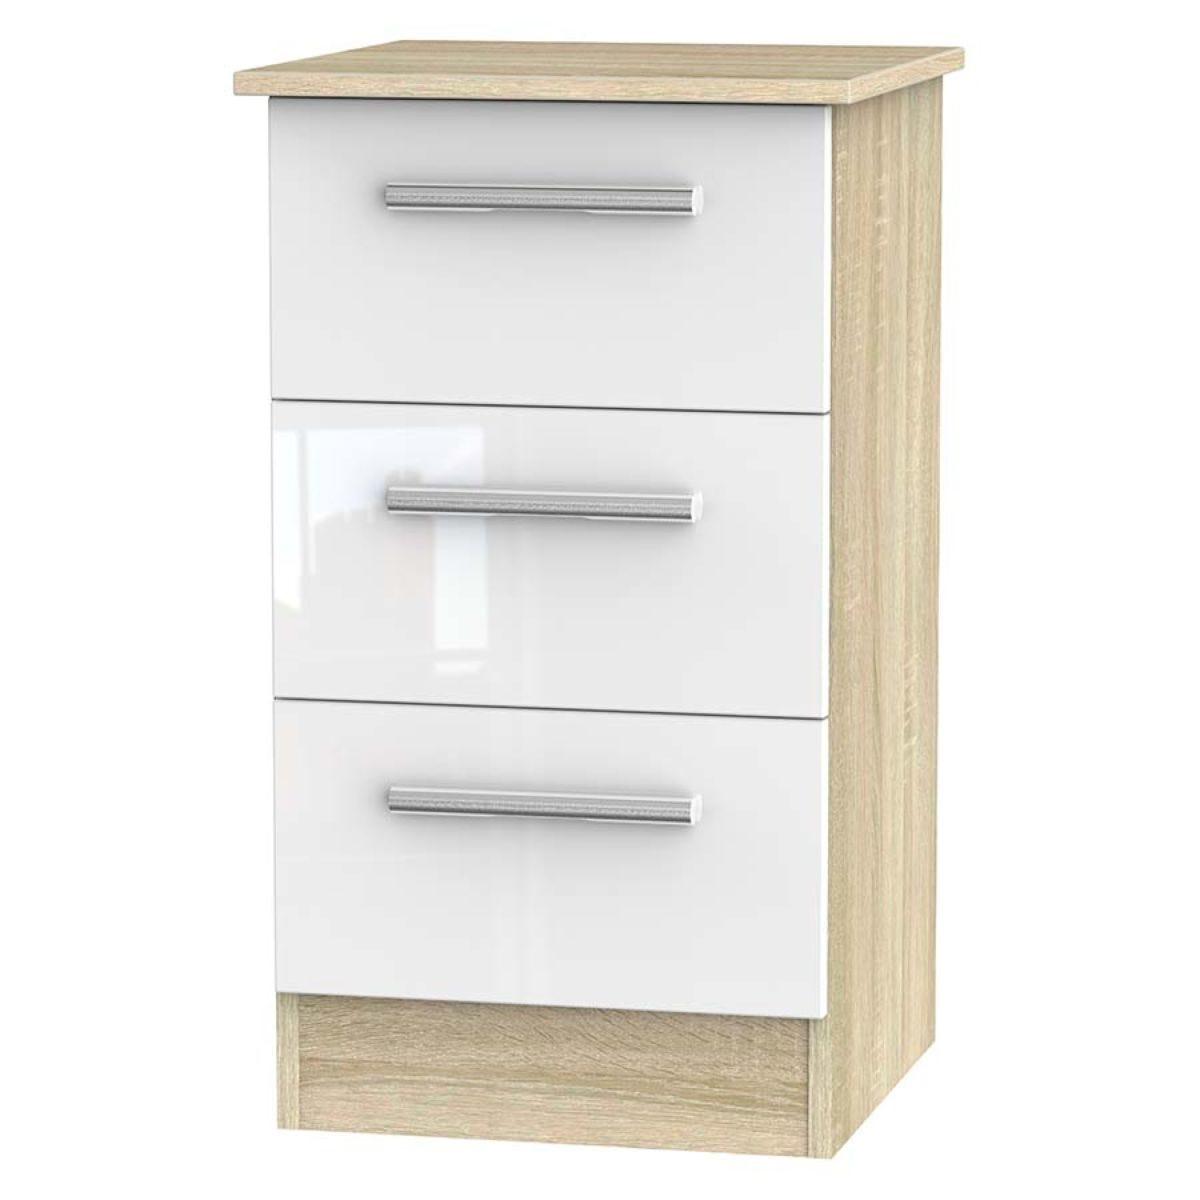 Goodland 3-Drawer Cabinet - White